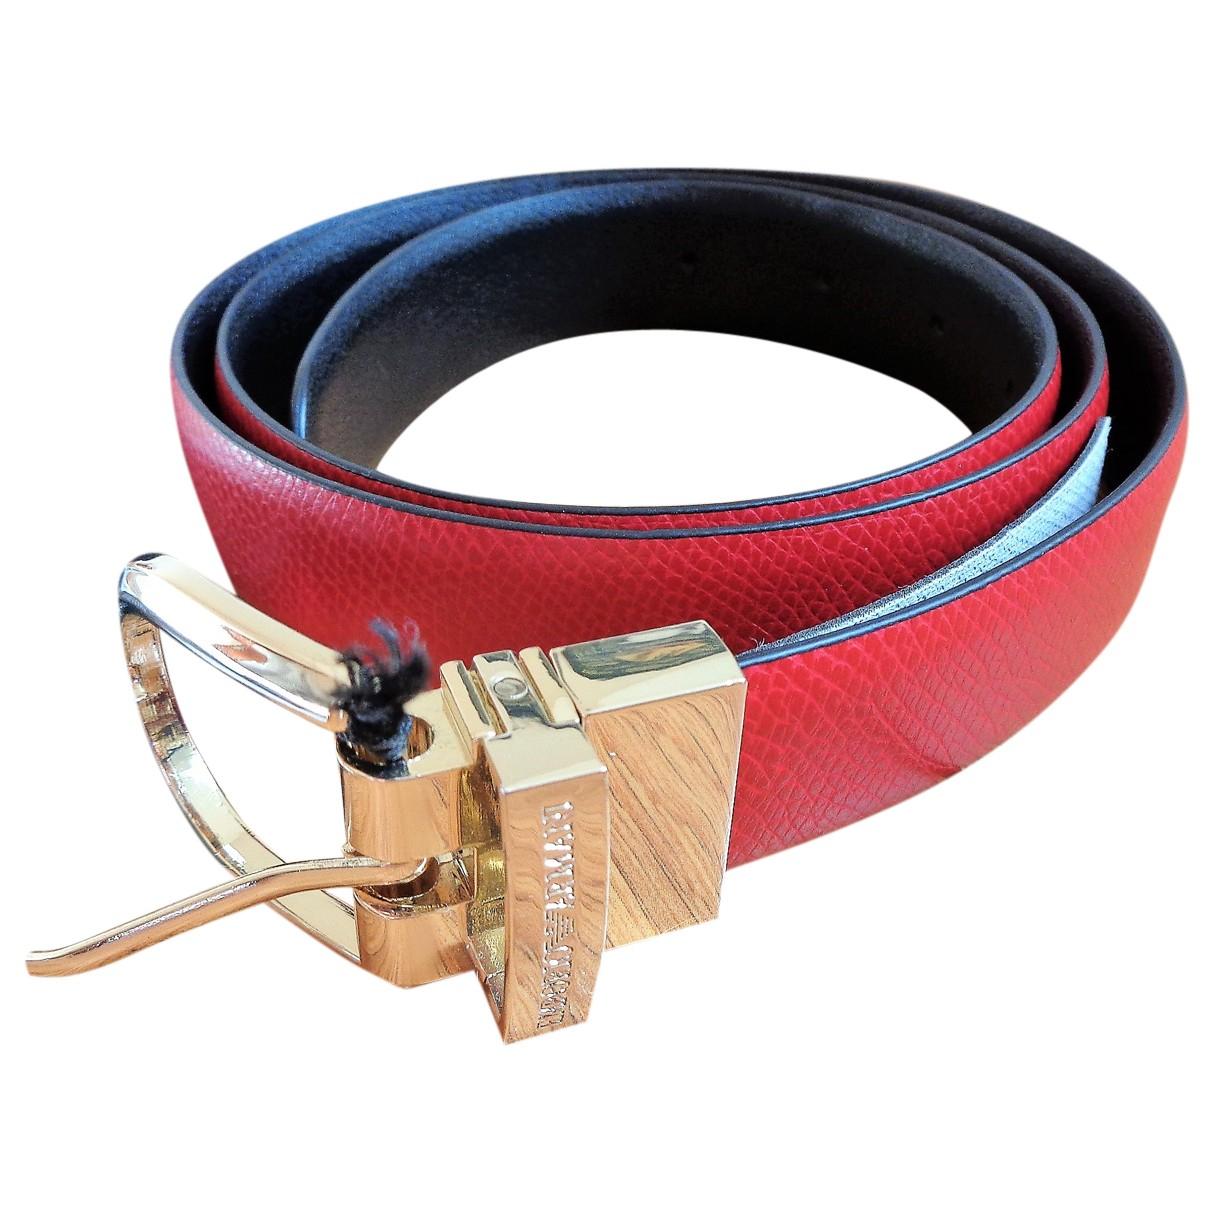 Emporio Armani N Red belt for Women 90 cm